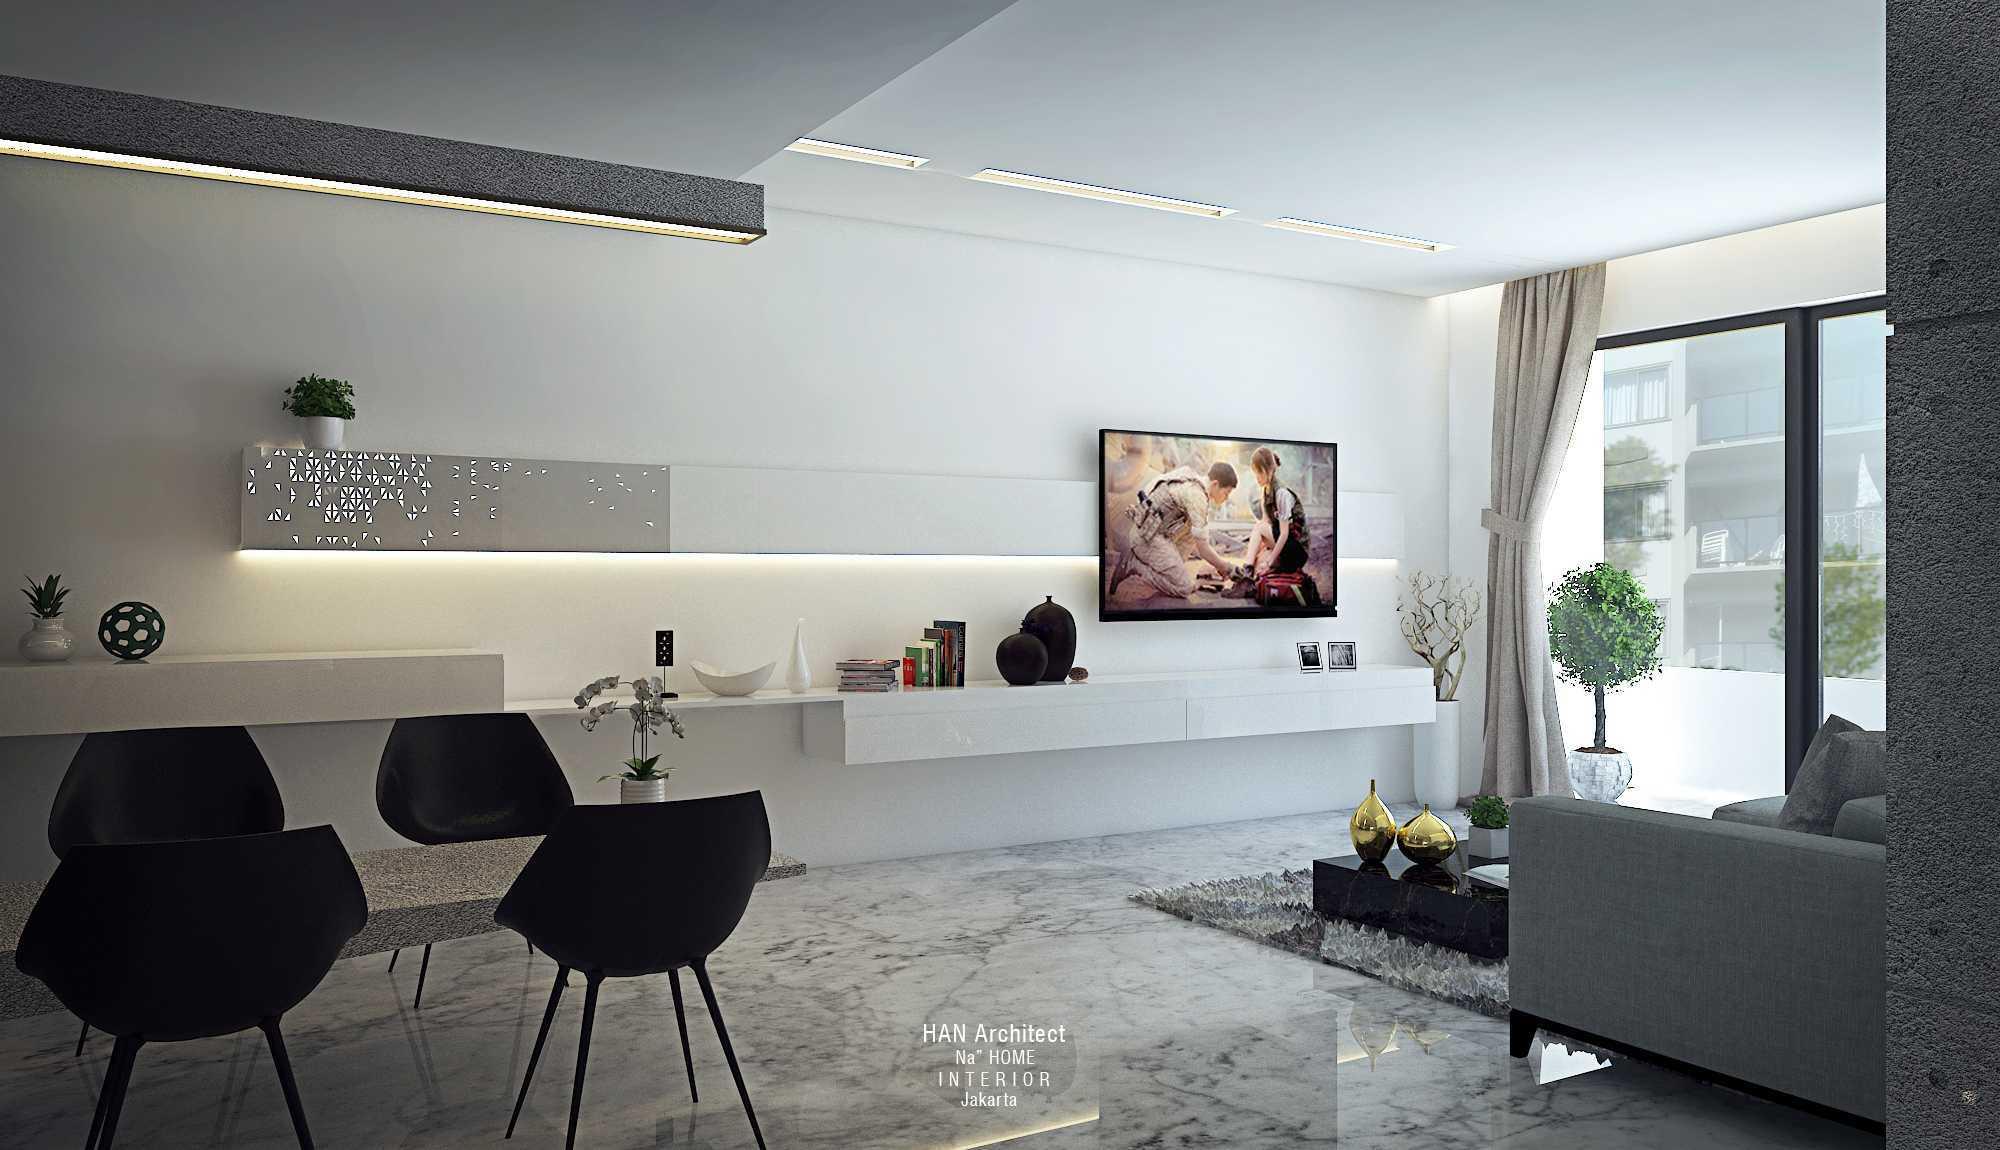 Han Architect Kc11 Jakarta Jakarta Living-1 Kontemporer  28052